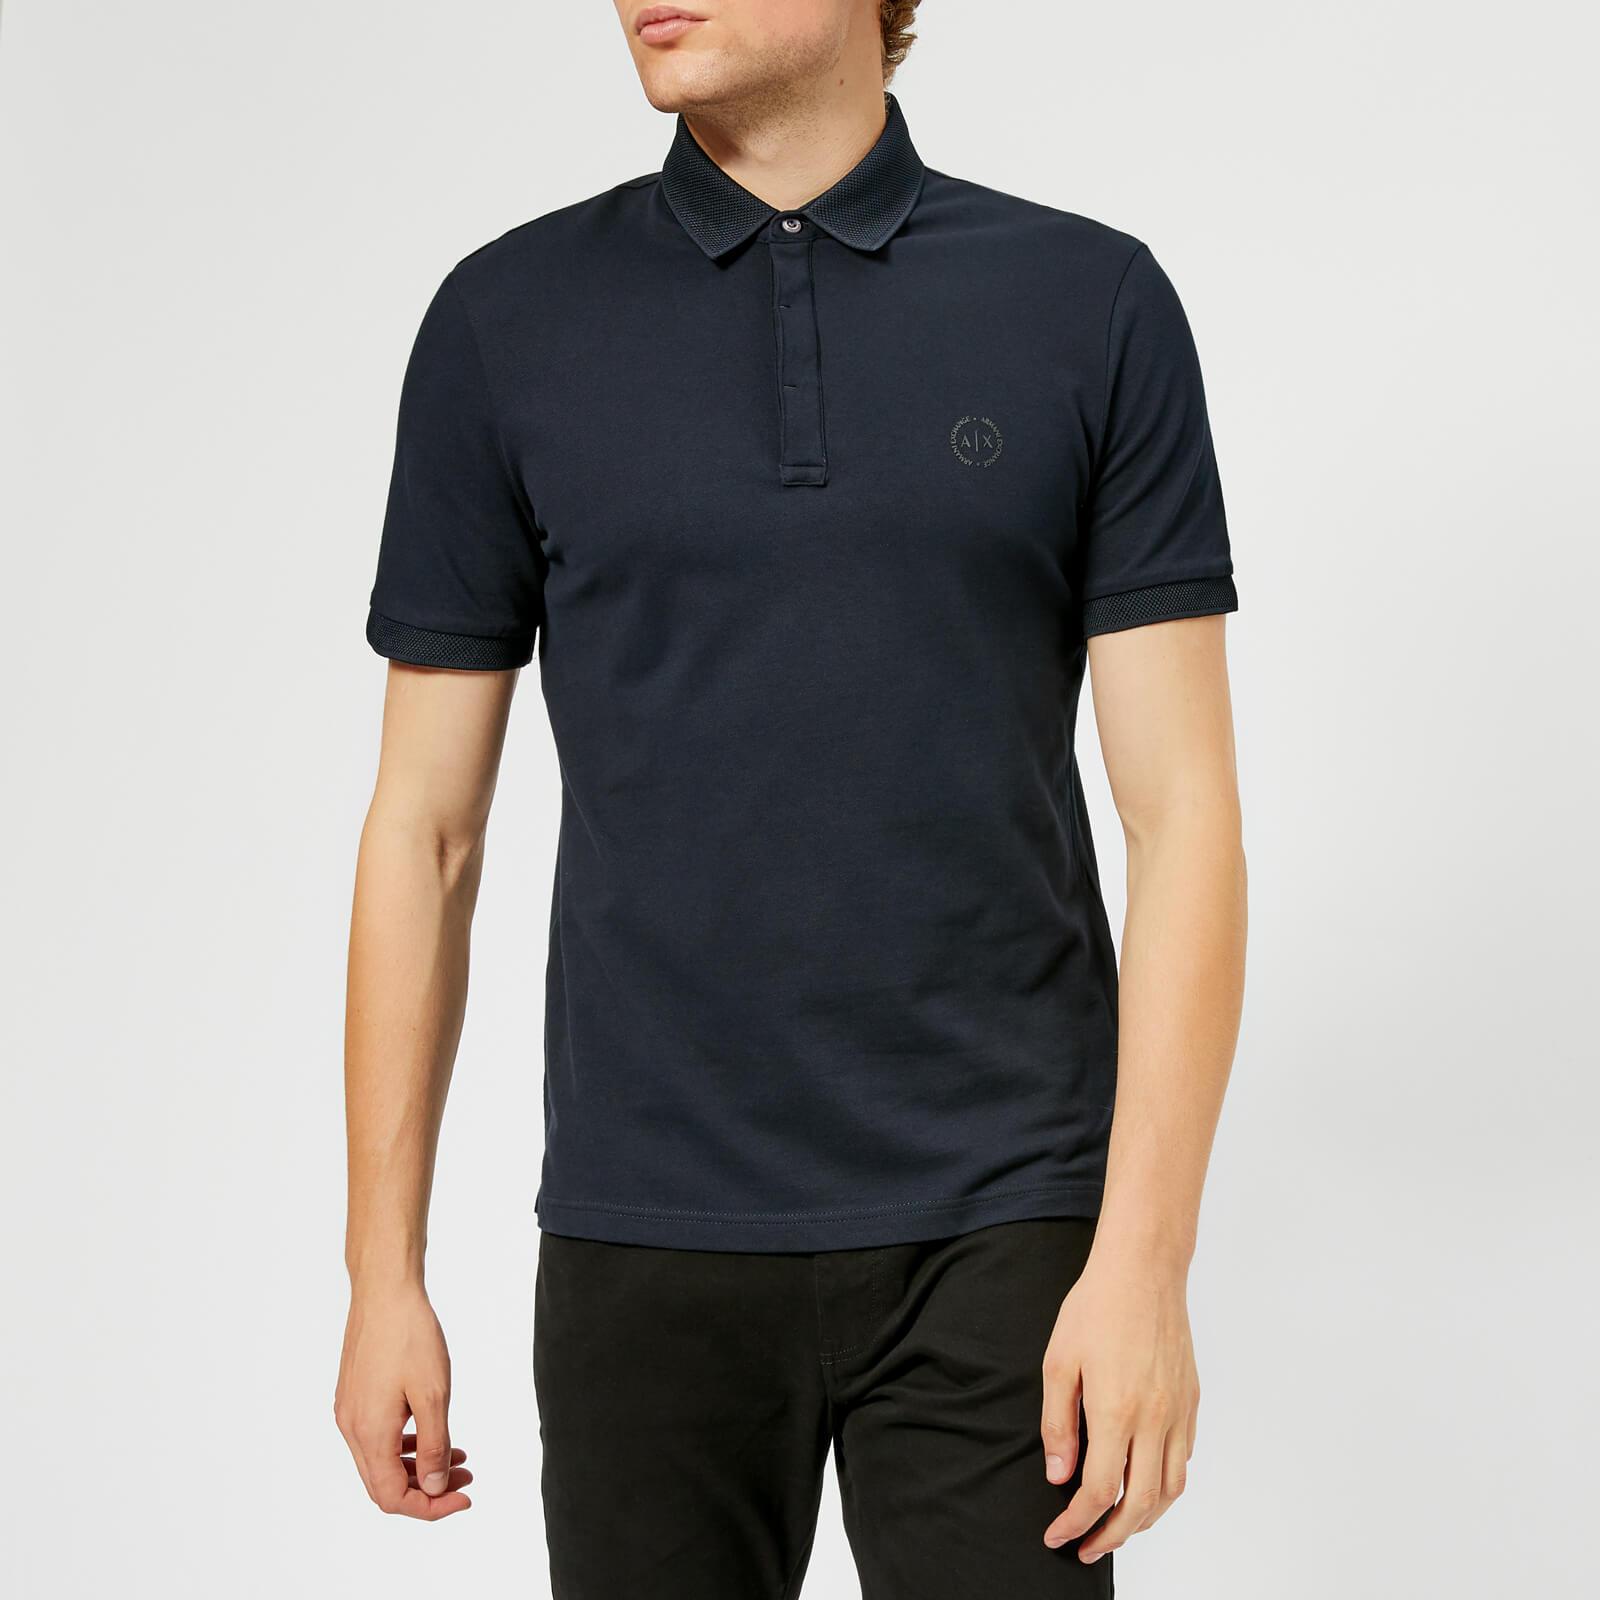 c05734c525 Armani Exchange Men s Tonal Logo Polo Shirt - Navy Clothing